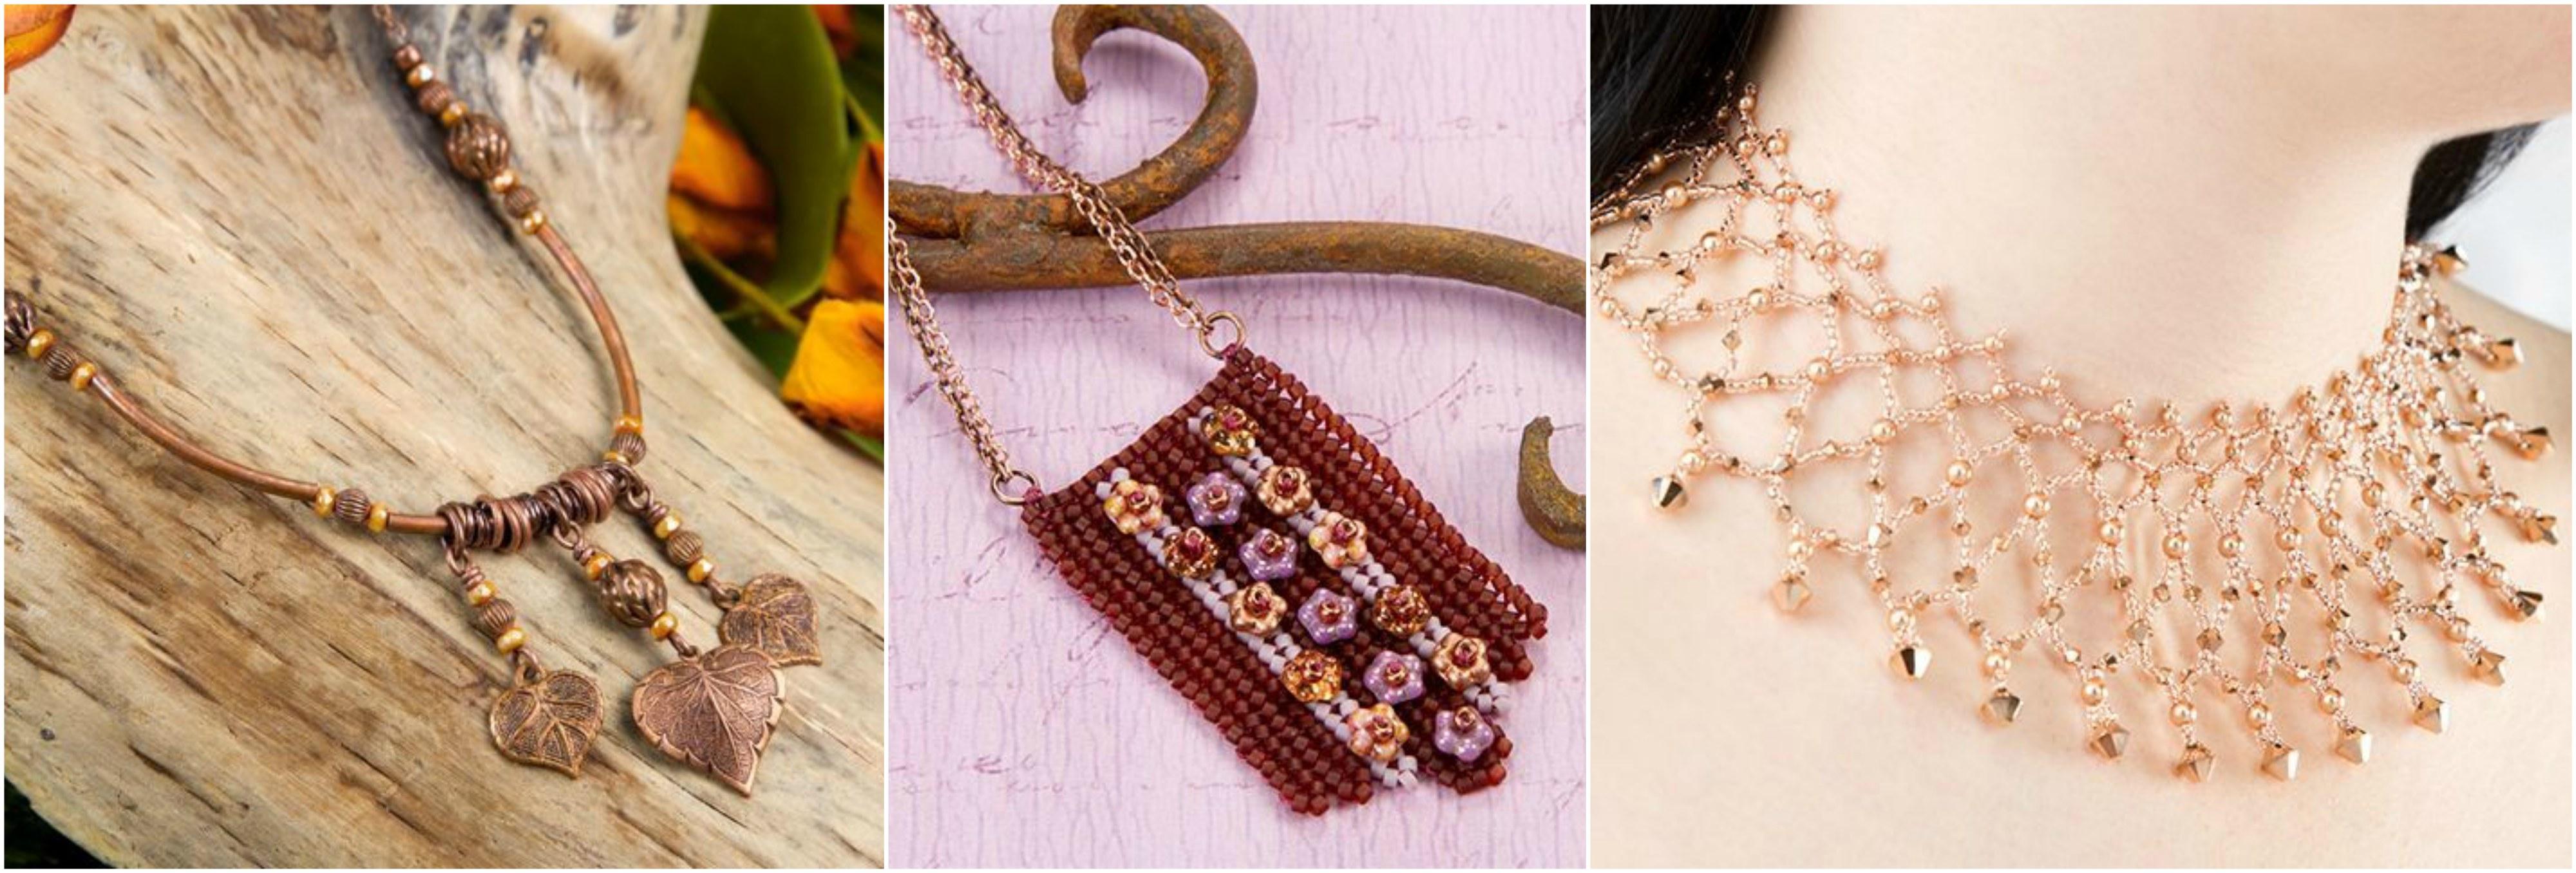 Artbeads designer Cheri Carlson's favorite necklaces.